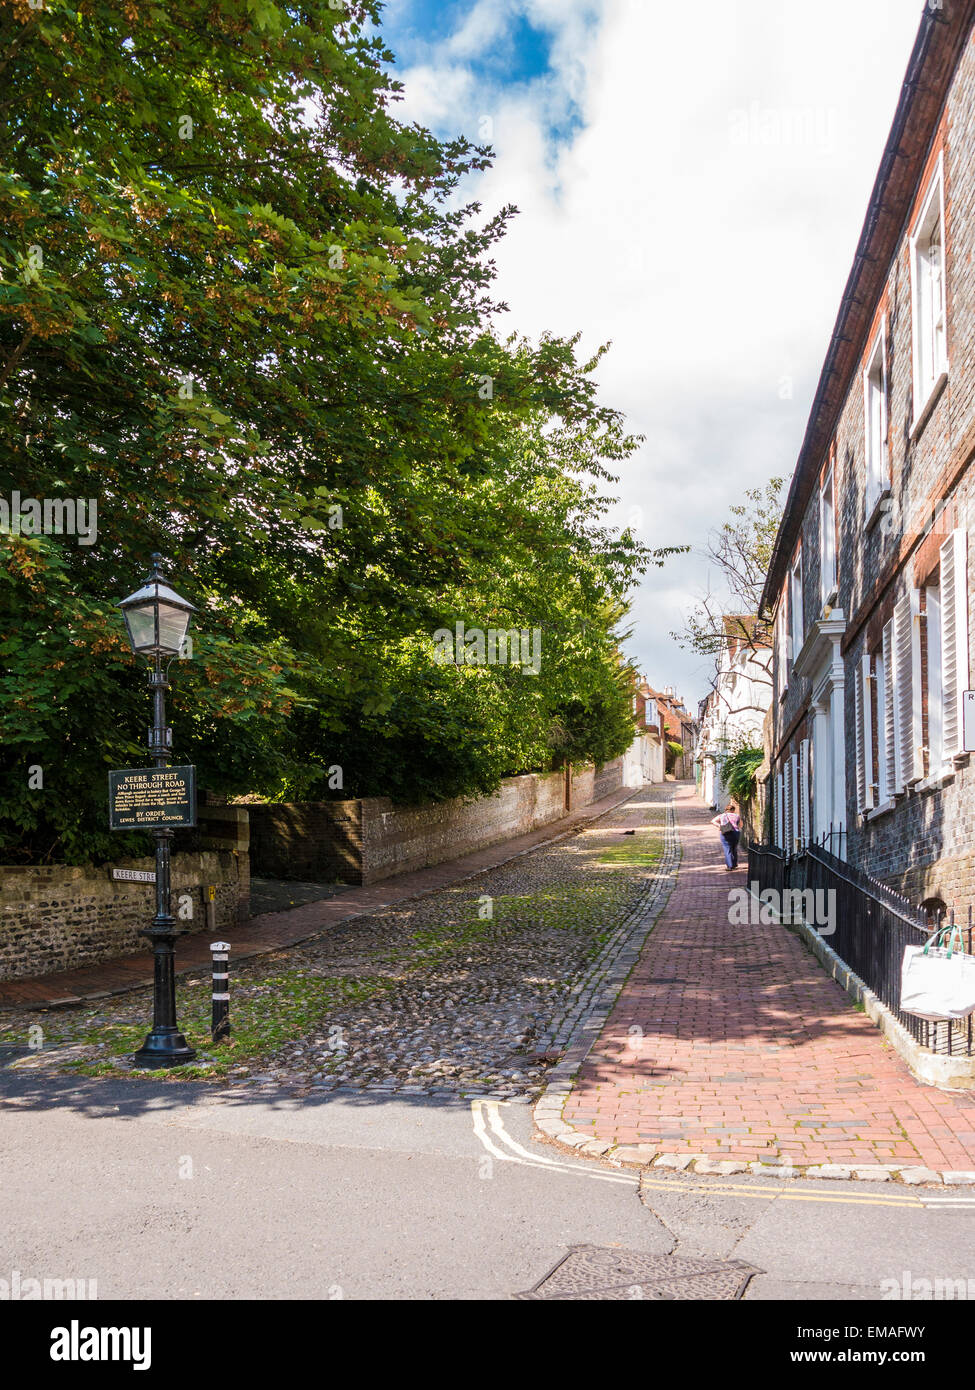 Keere Street, Lewes, East Sussex. Stock Photo